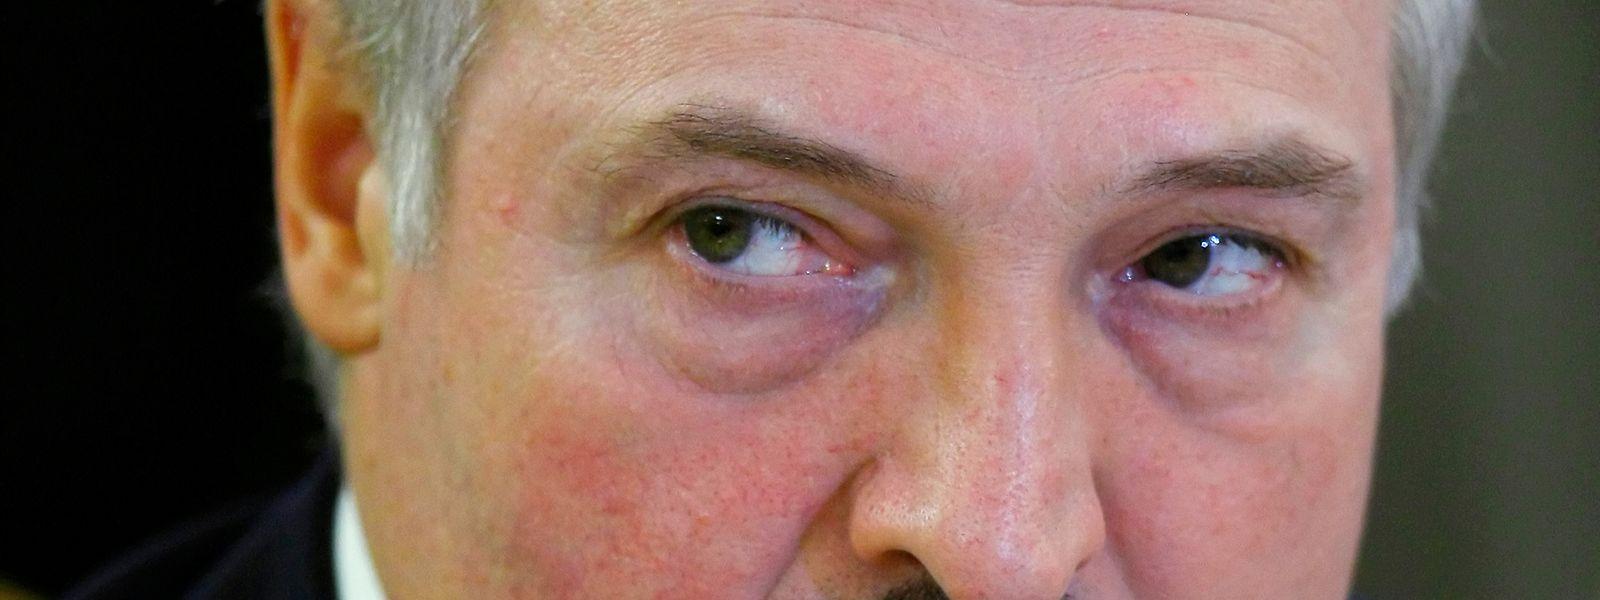 Scharfer, kalter Blick, markanter Schnauzbart: Alexander Lukaschenko.